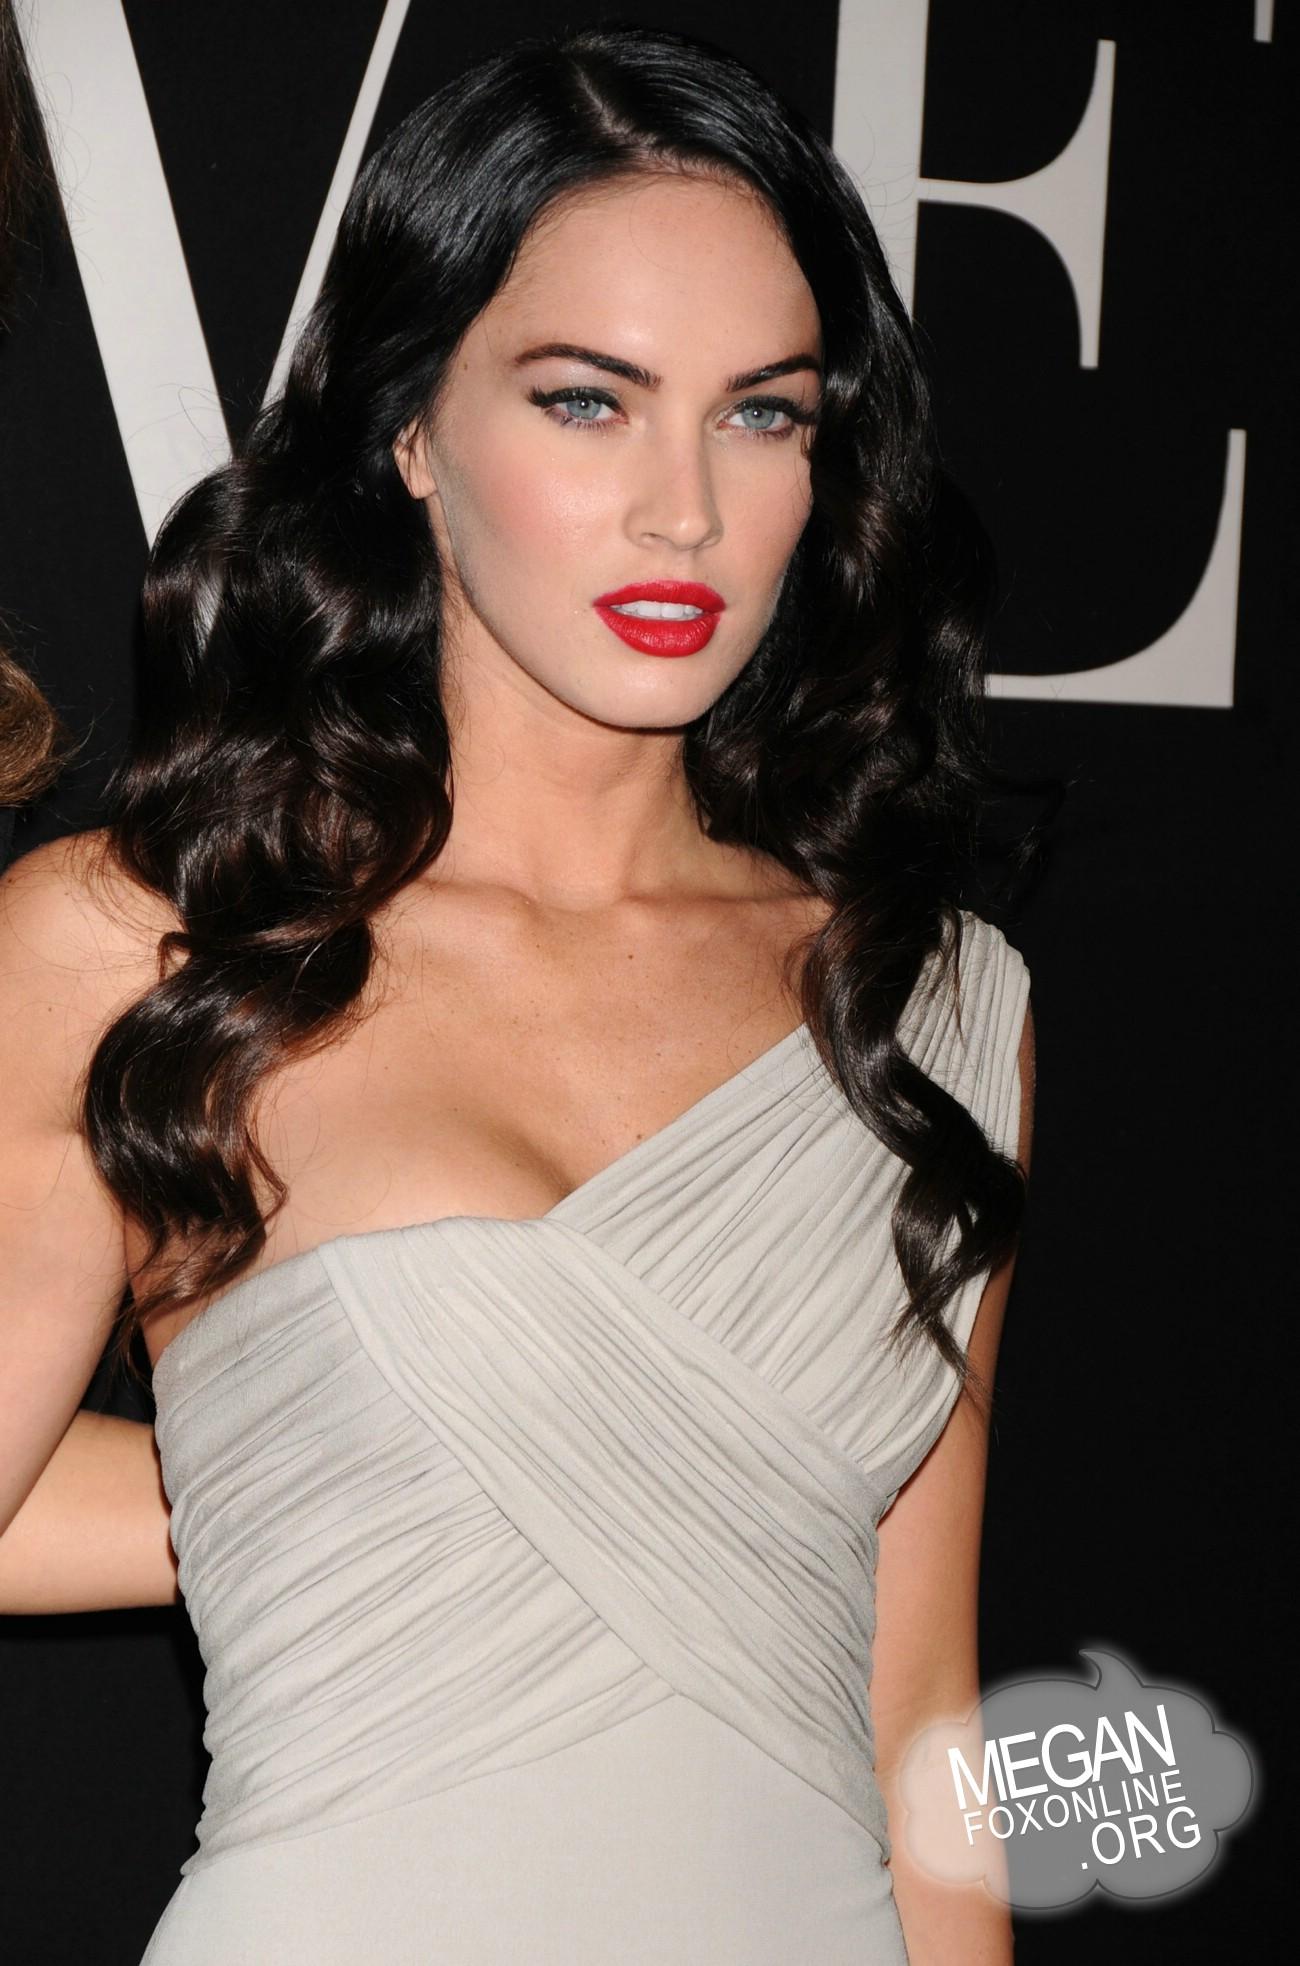 Megan Fox Daily Photo Gallery | Megan-Fox.com: Click image to close ...